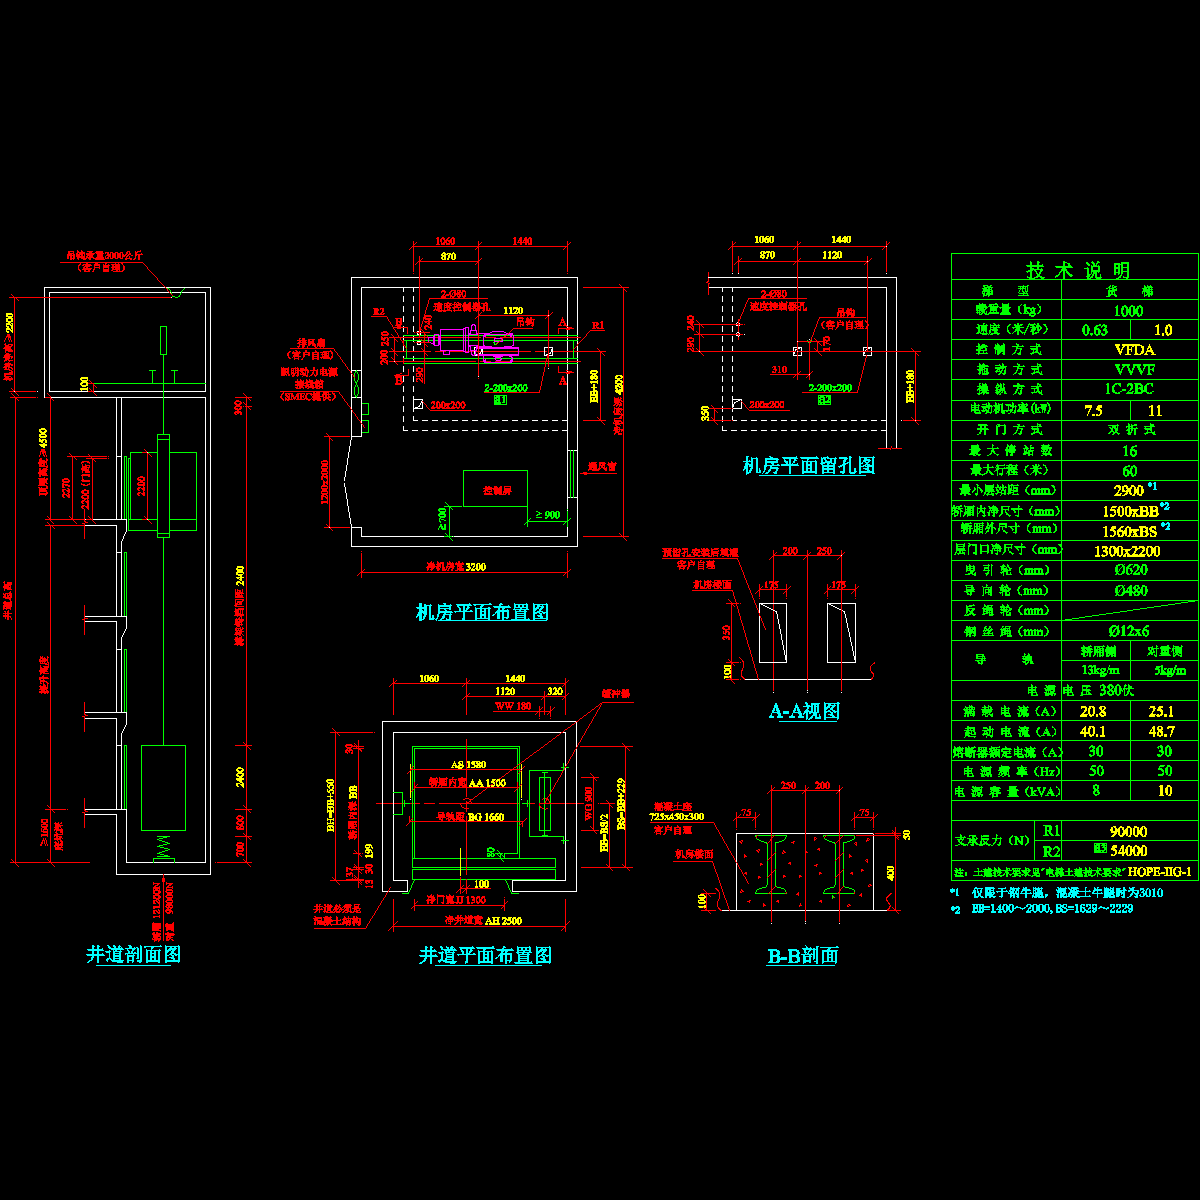 004-1t货梯单开门1米速度(1400~2200)).dwg